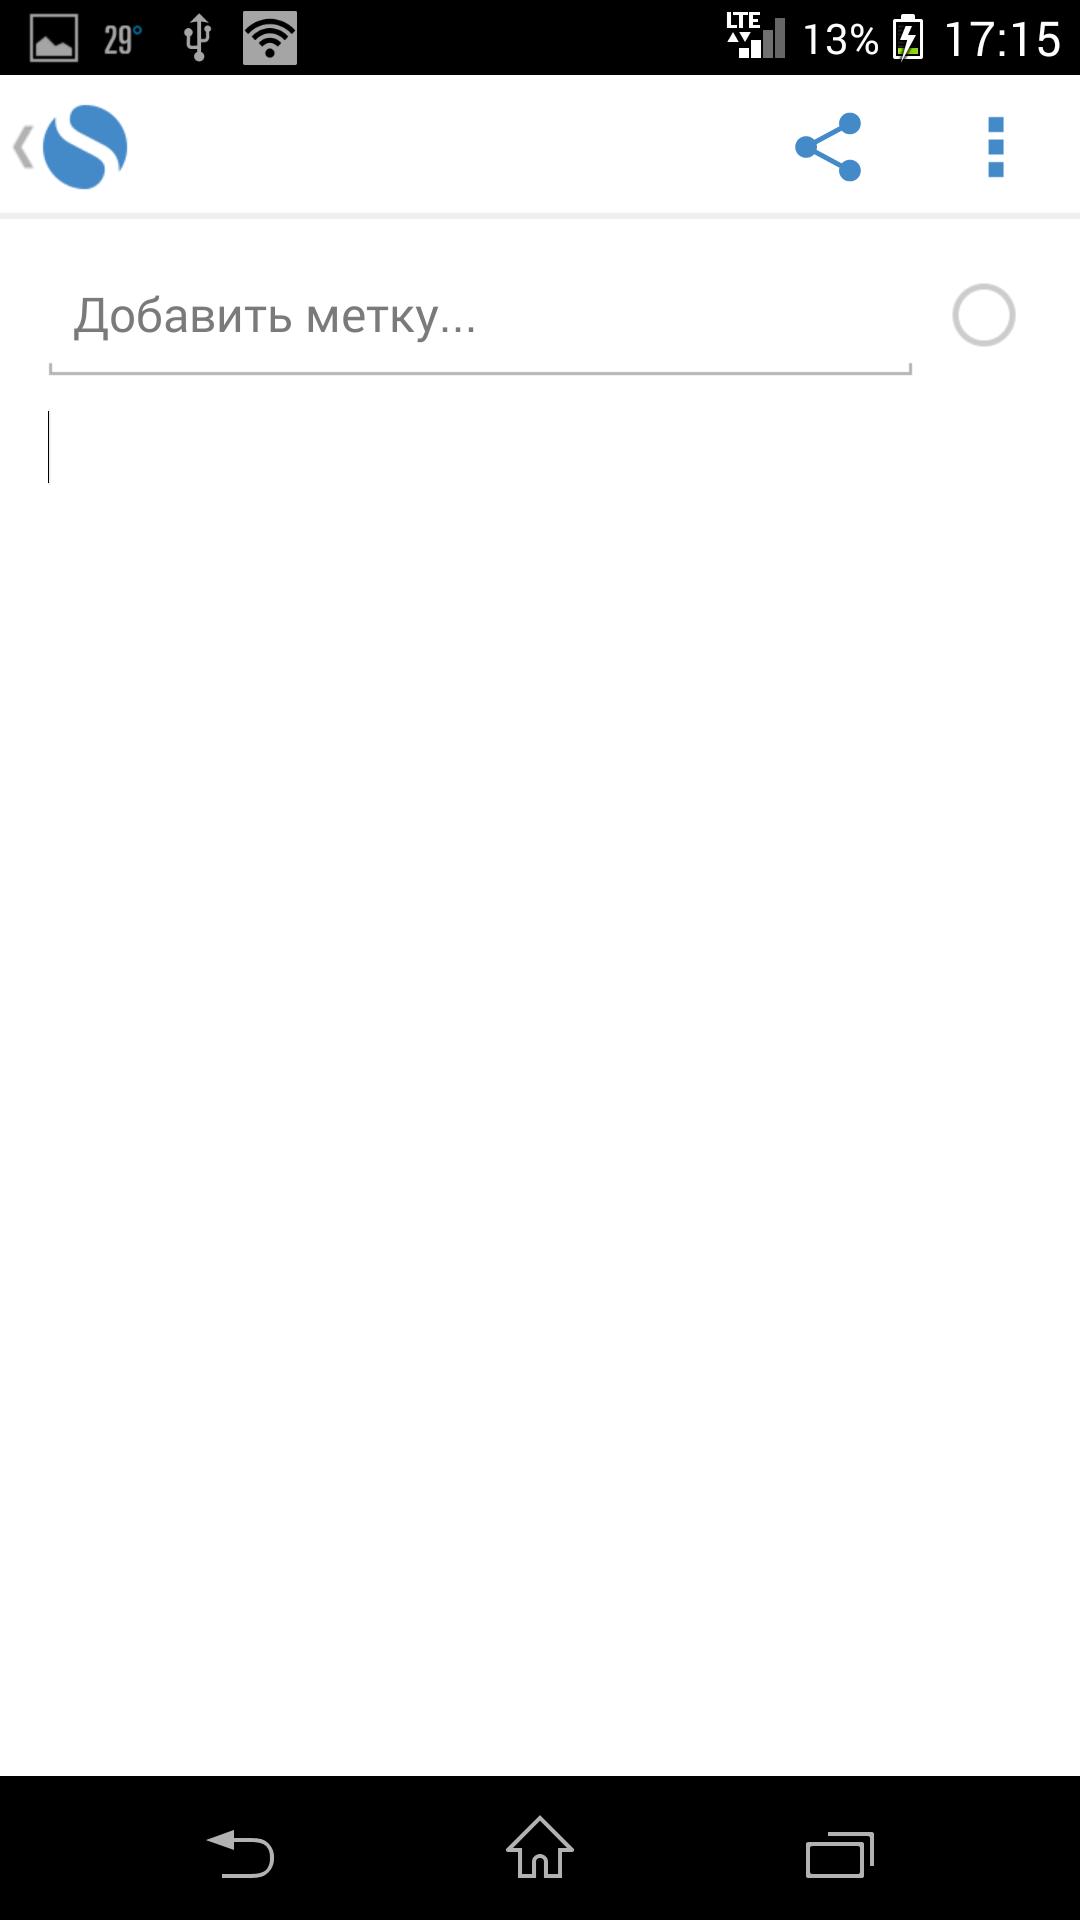 Создание заметки - Simplenote для Android